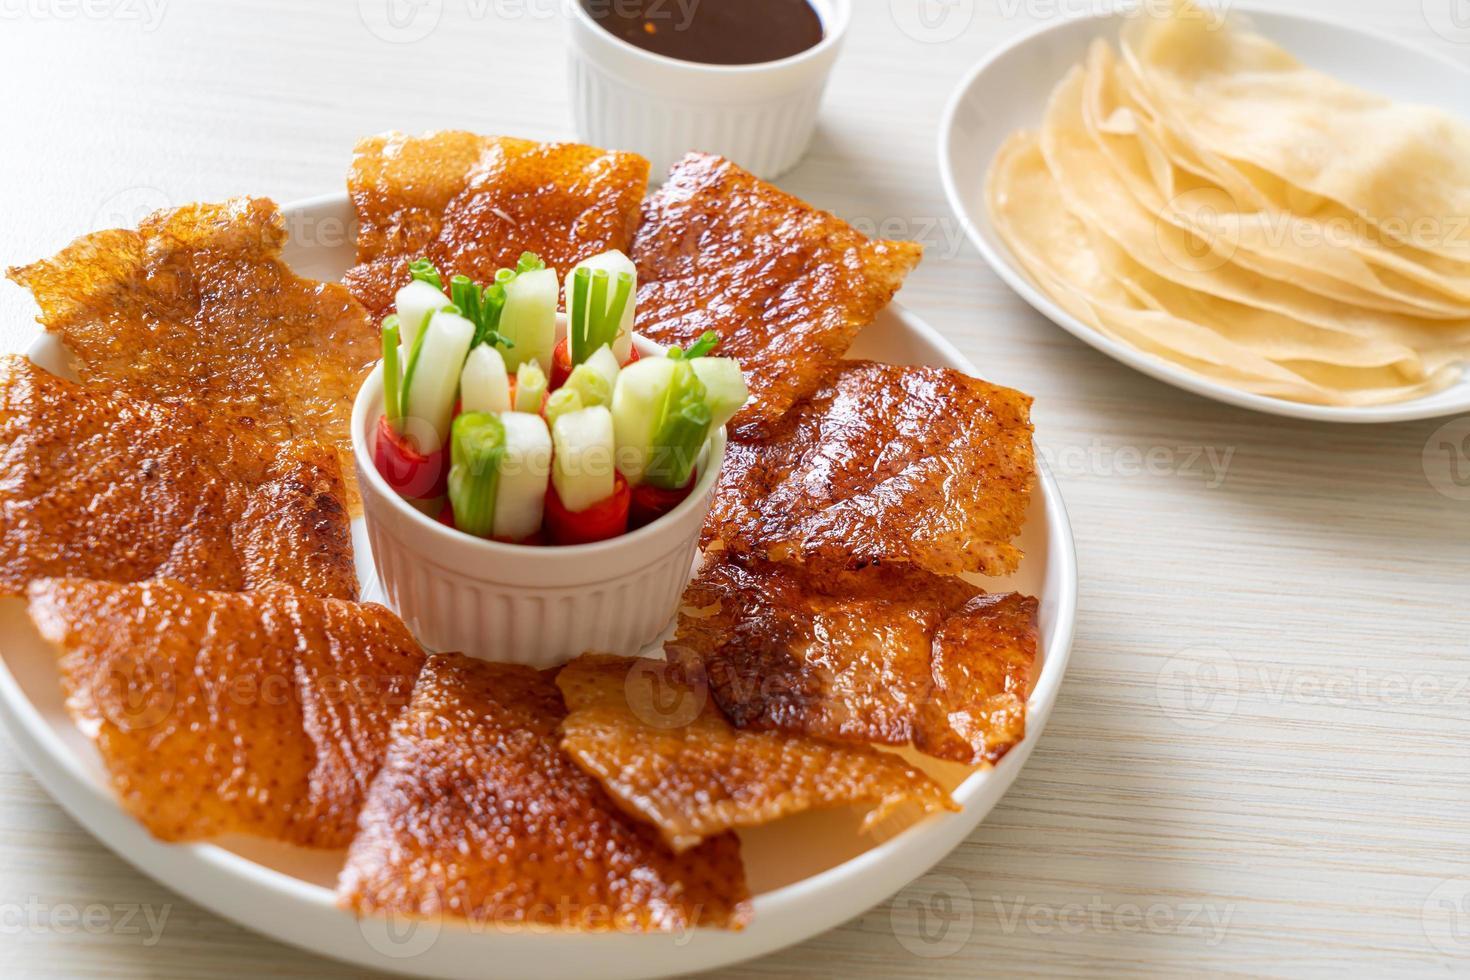 pato pekín - comida china foto